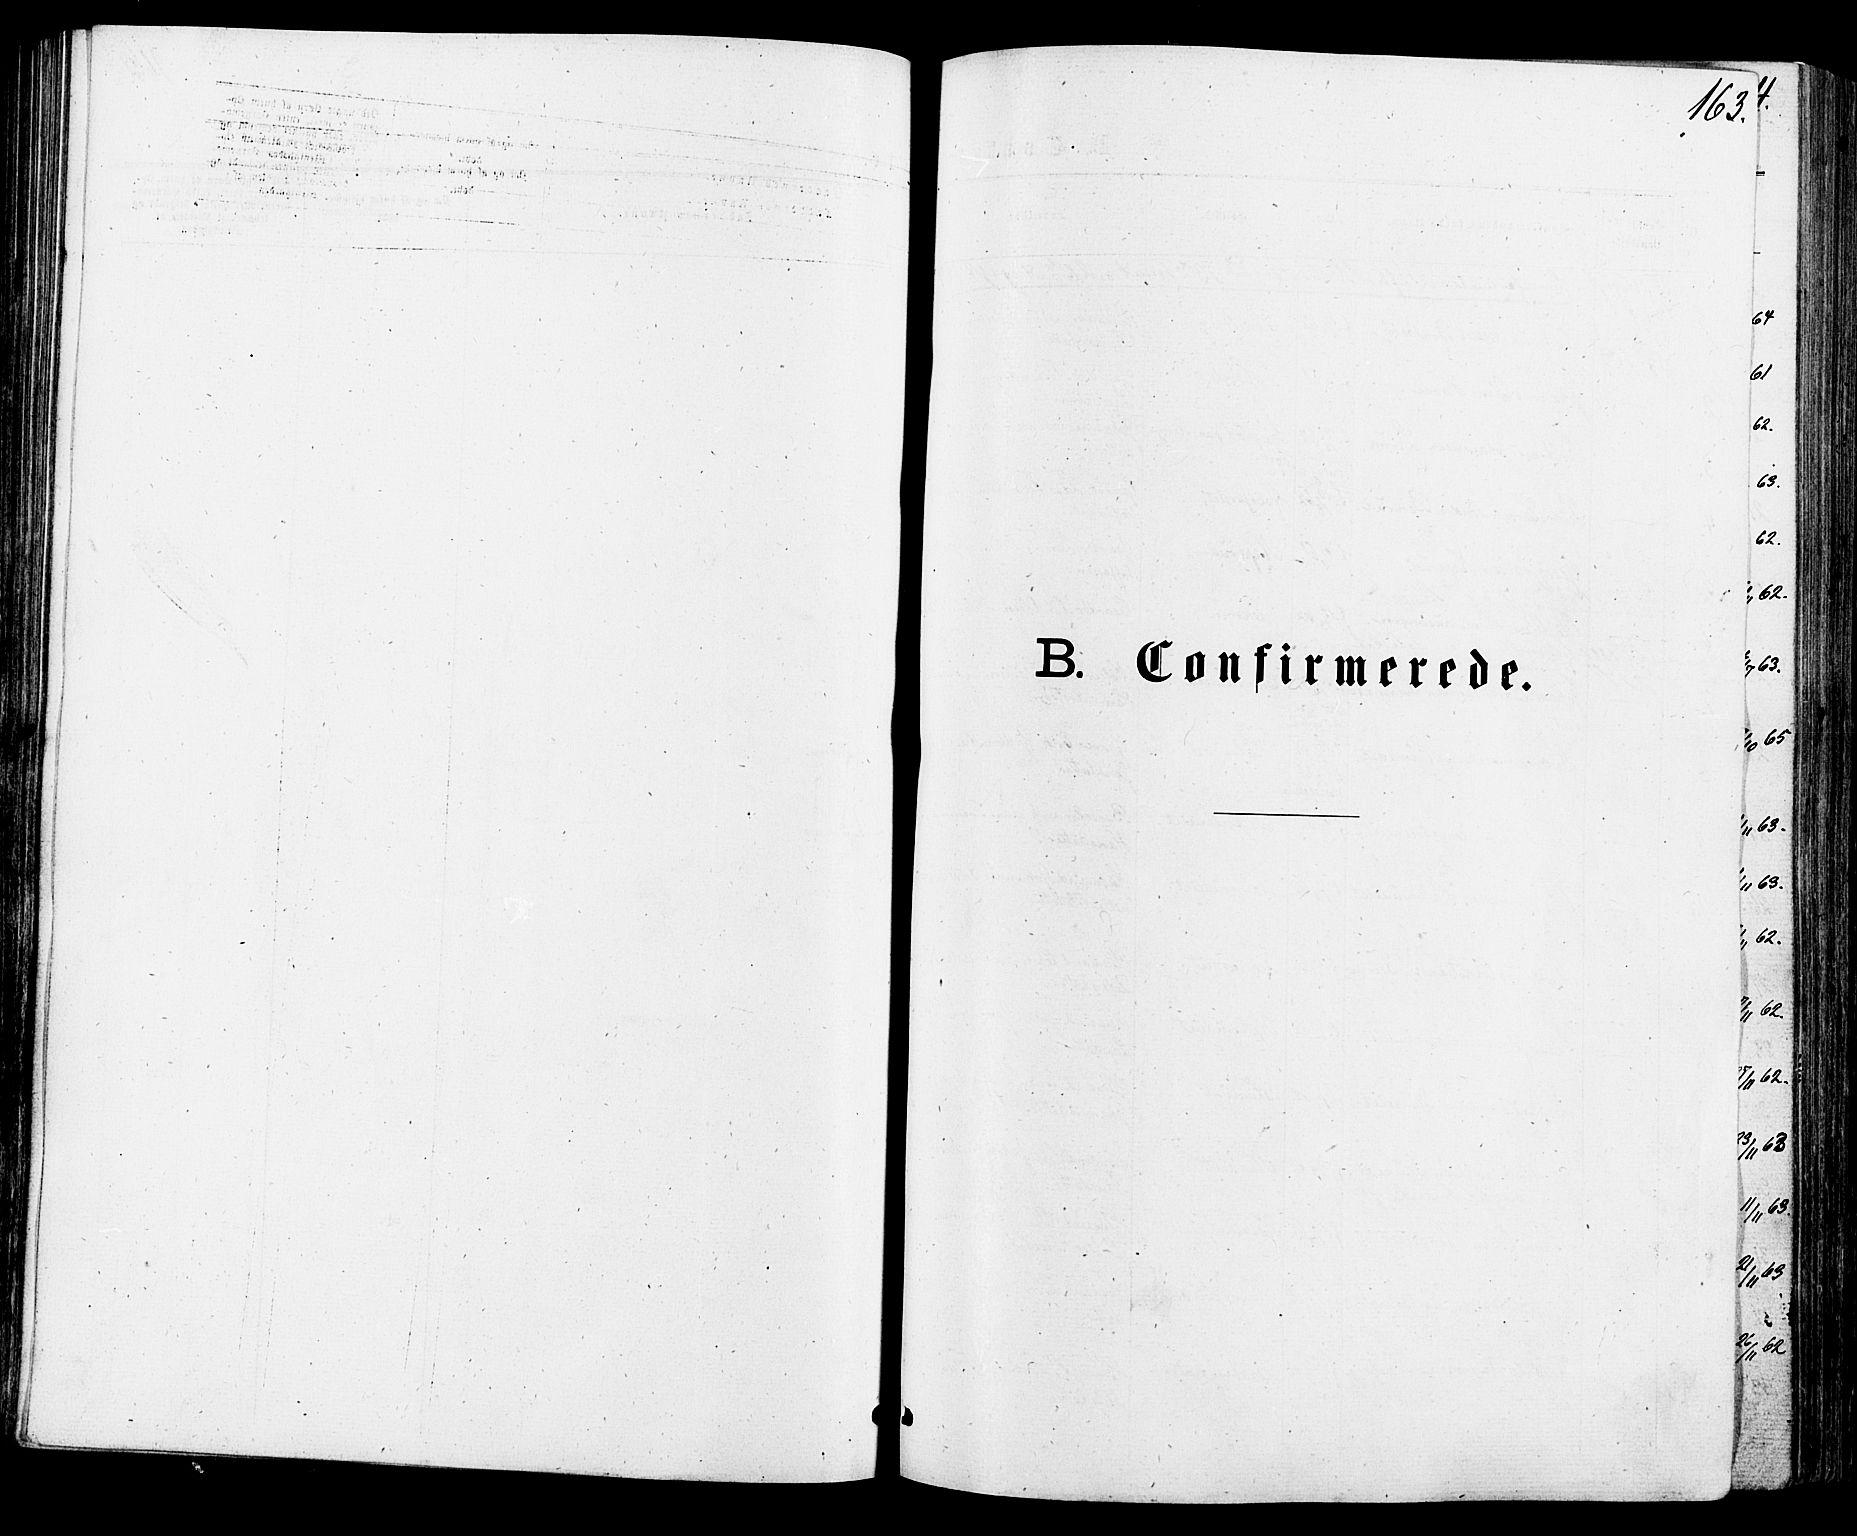 SAH, Biri prestekontor, Ministerialbok nr. 6, 1877-1886, s. 163